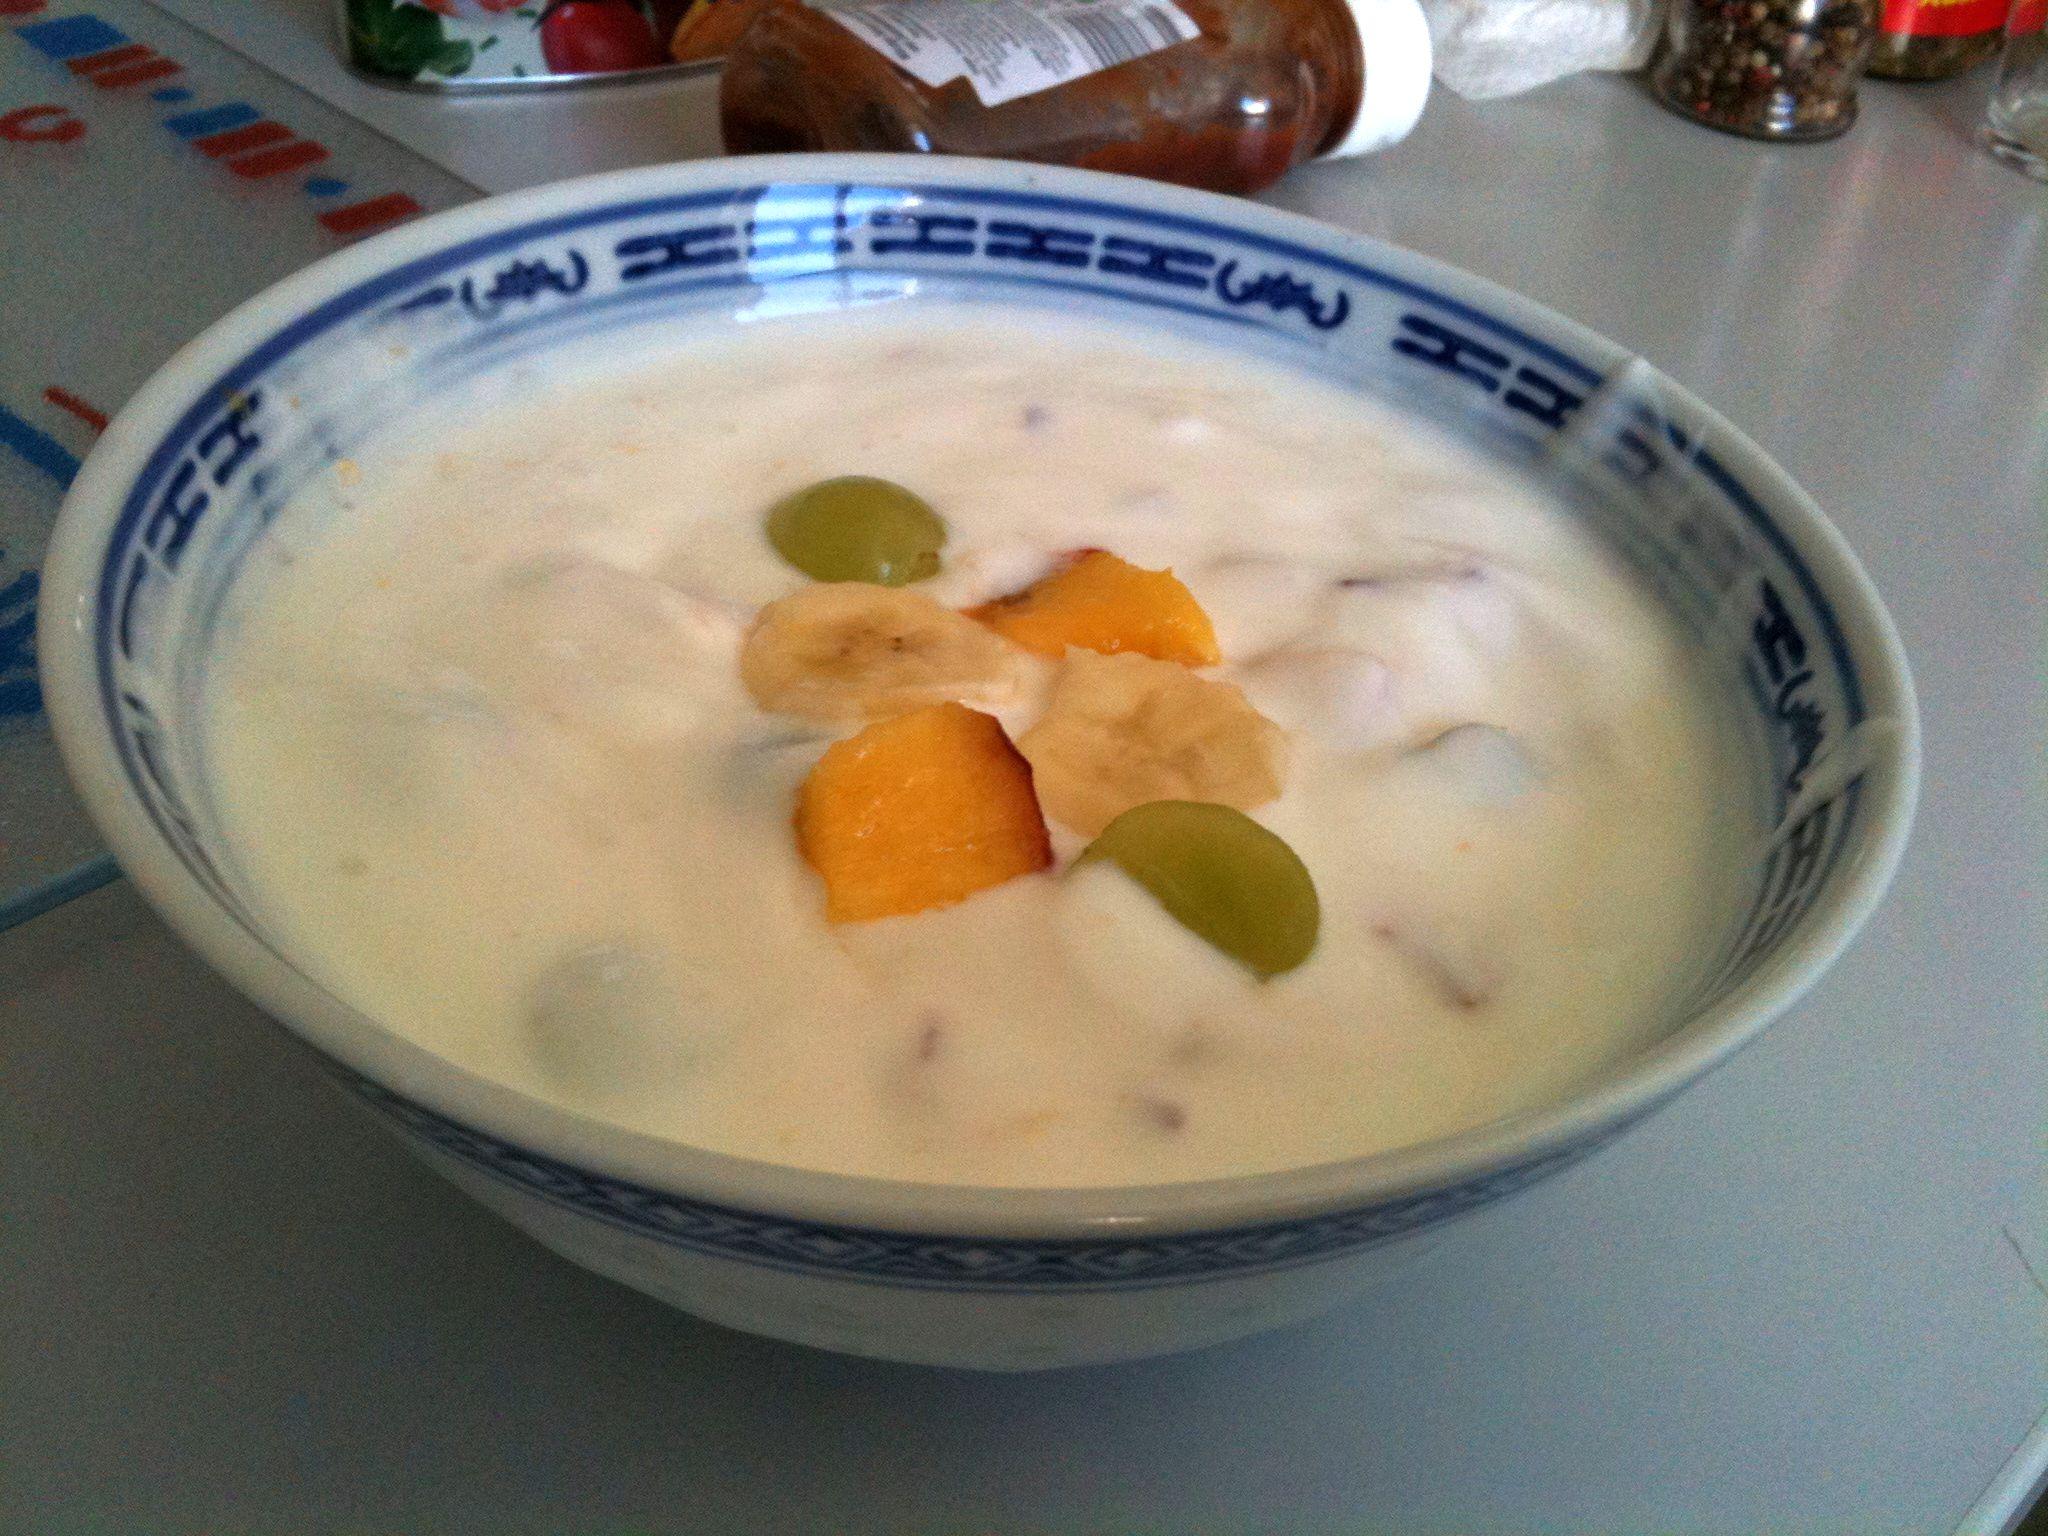 https://foodloader.net/nico_2011-06-28_bananen-pfirsich-trauben-joghurt.jpg